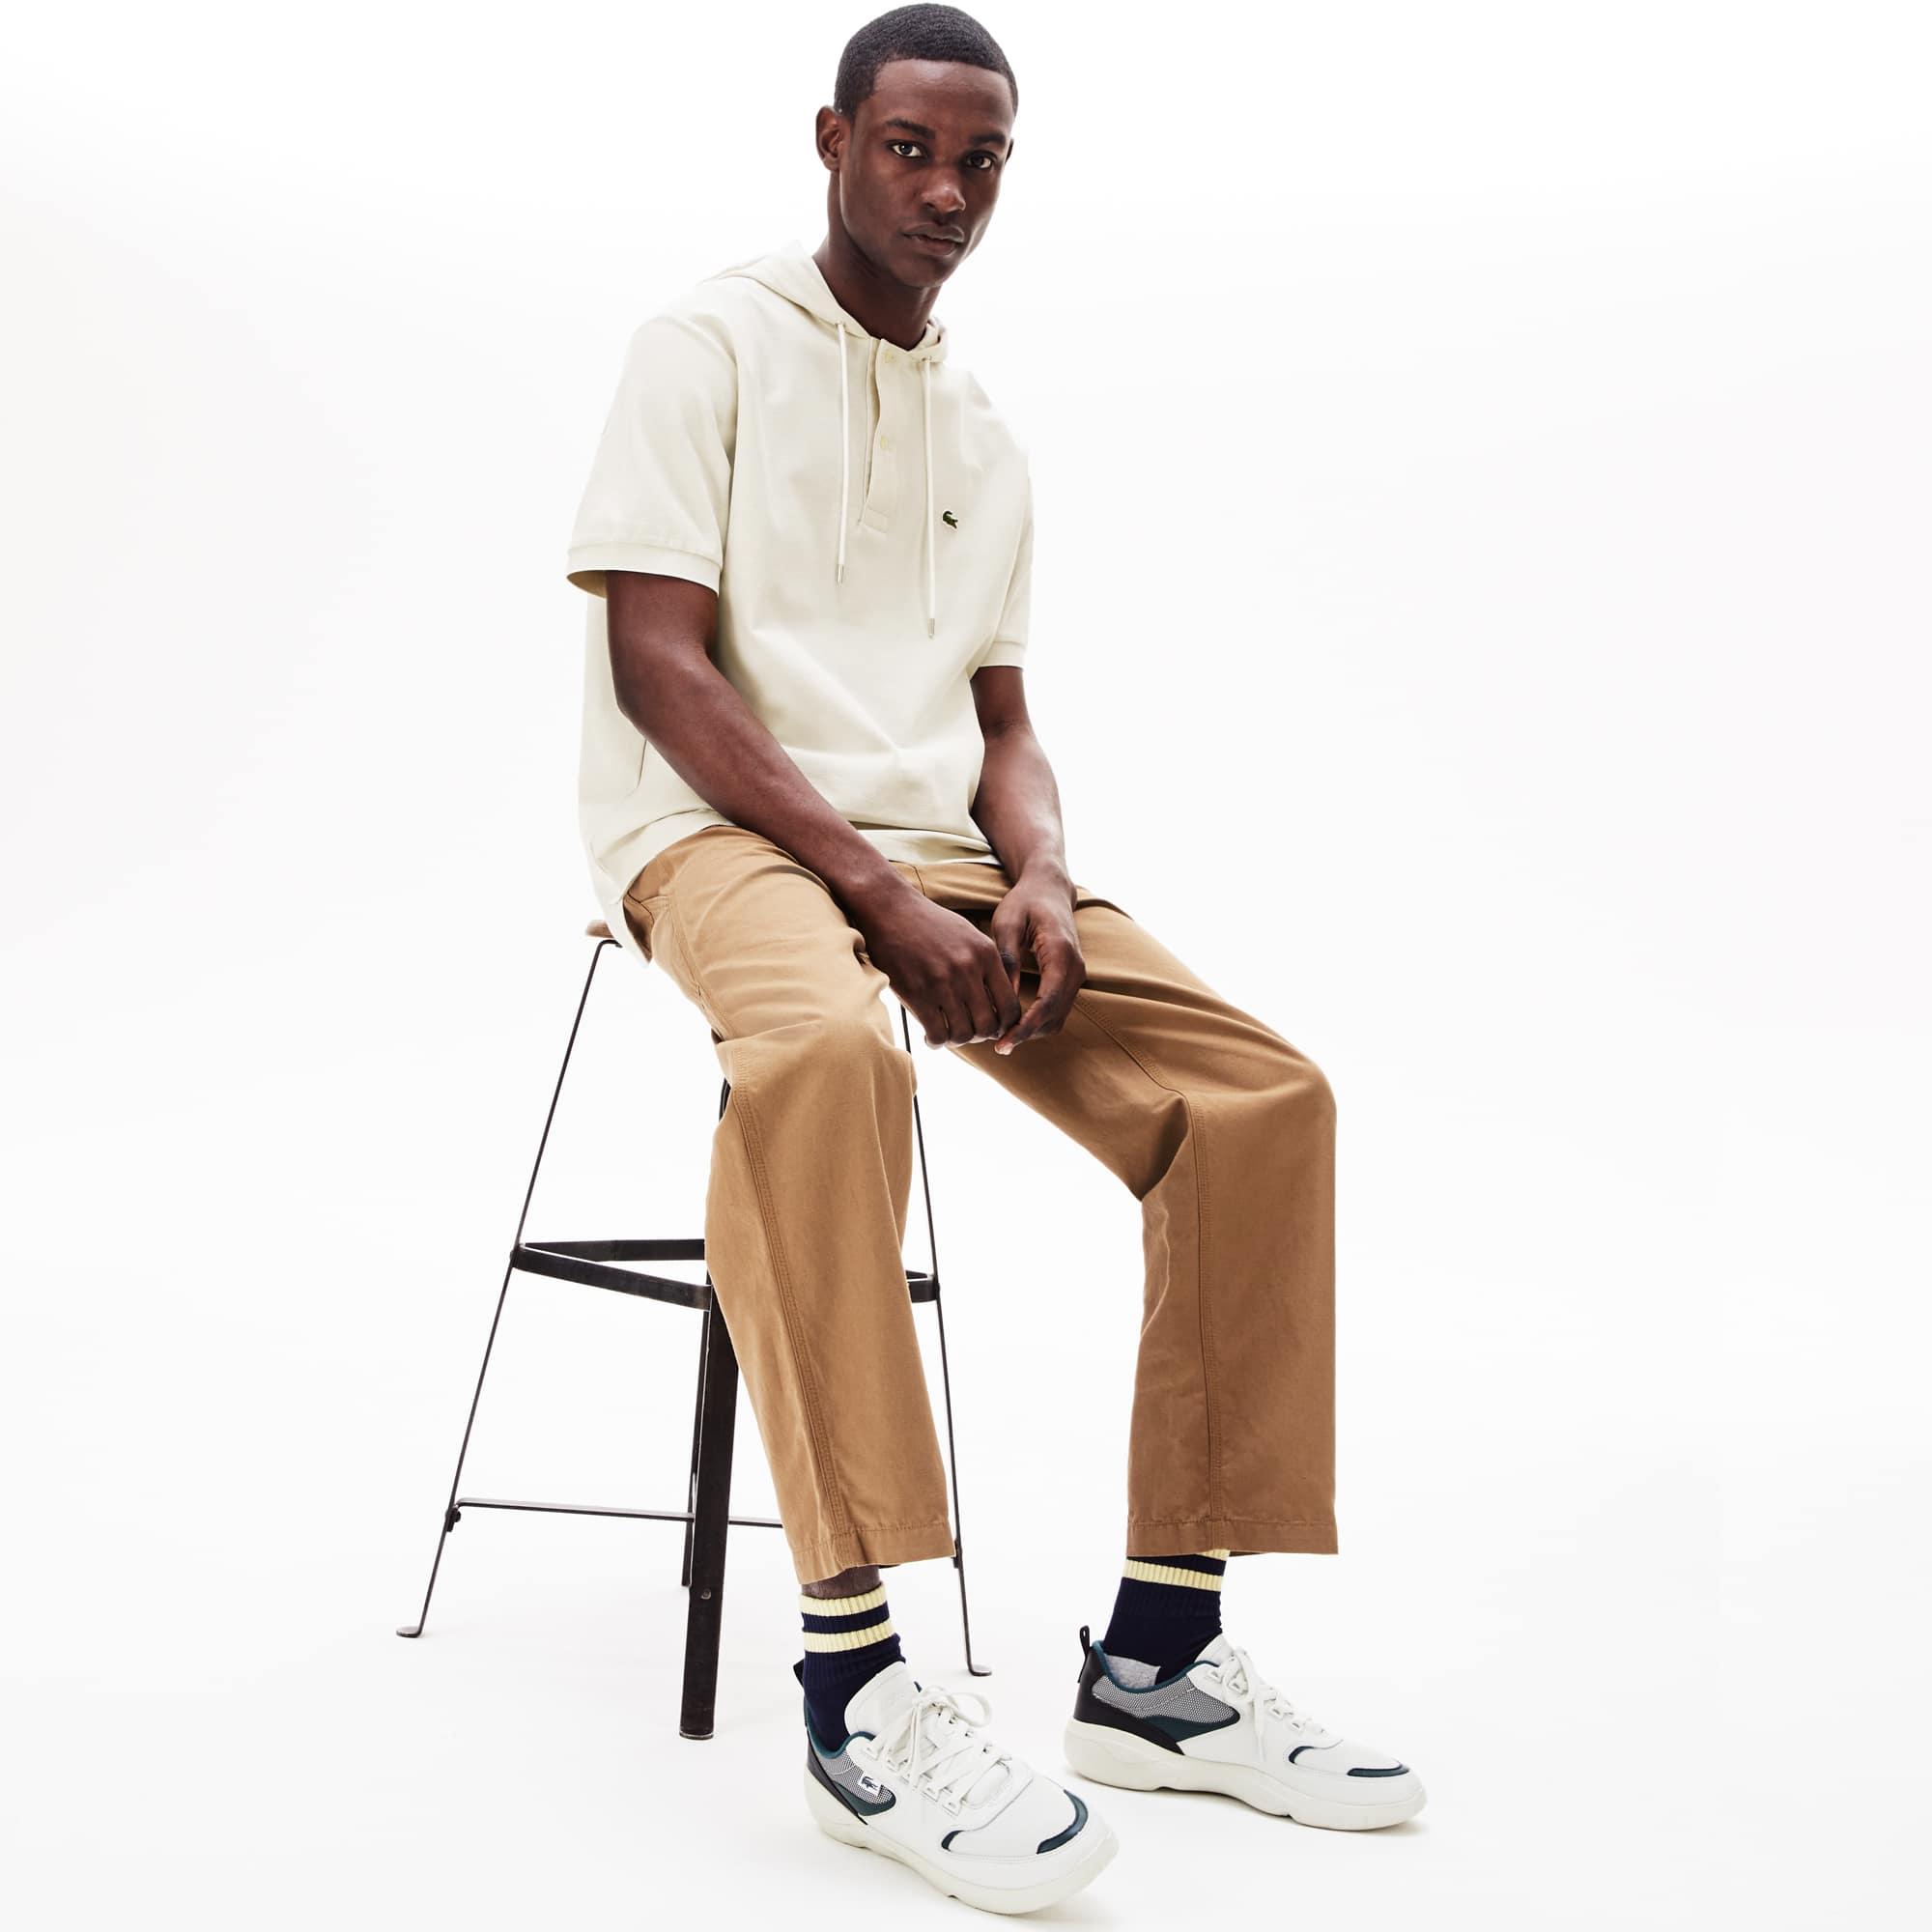 e6933889 Men's Polo Shirts   Lacoste Polo Shirts for Men   LACOSTE